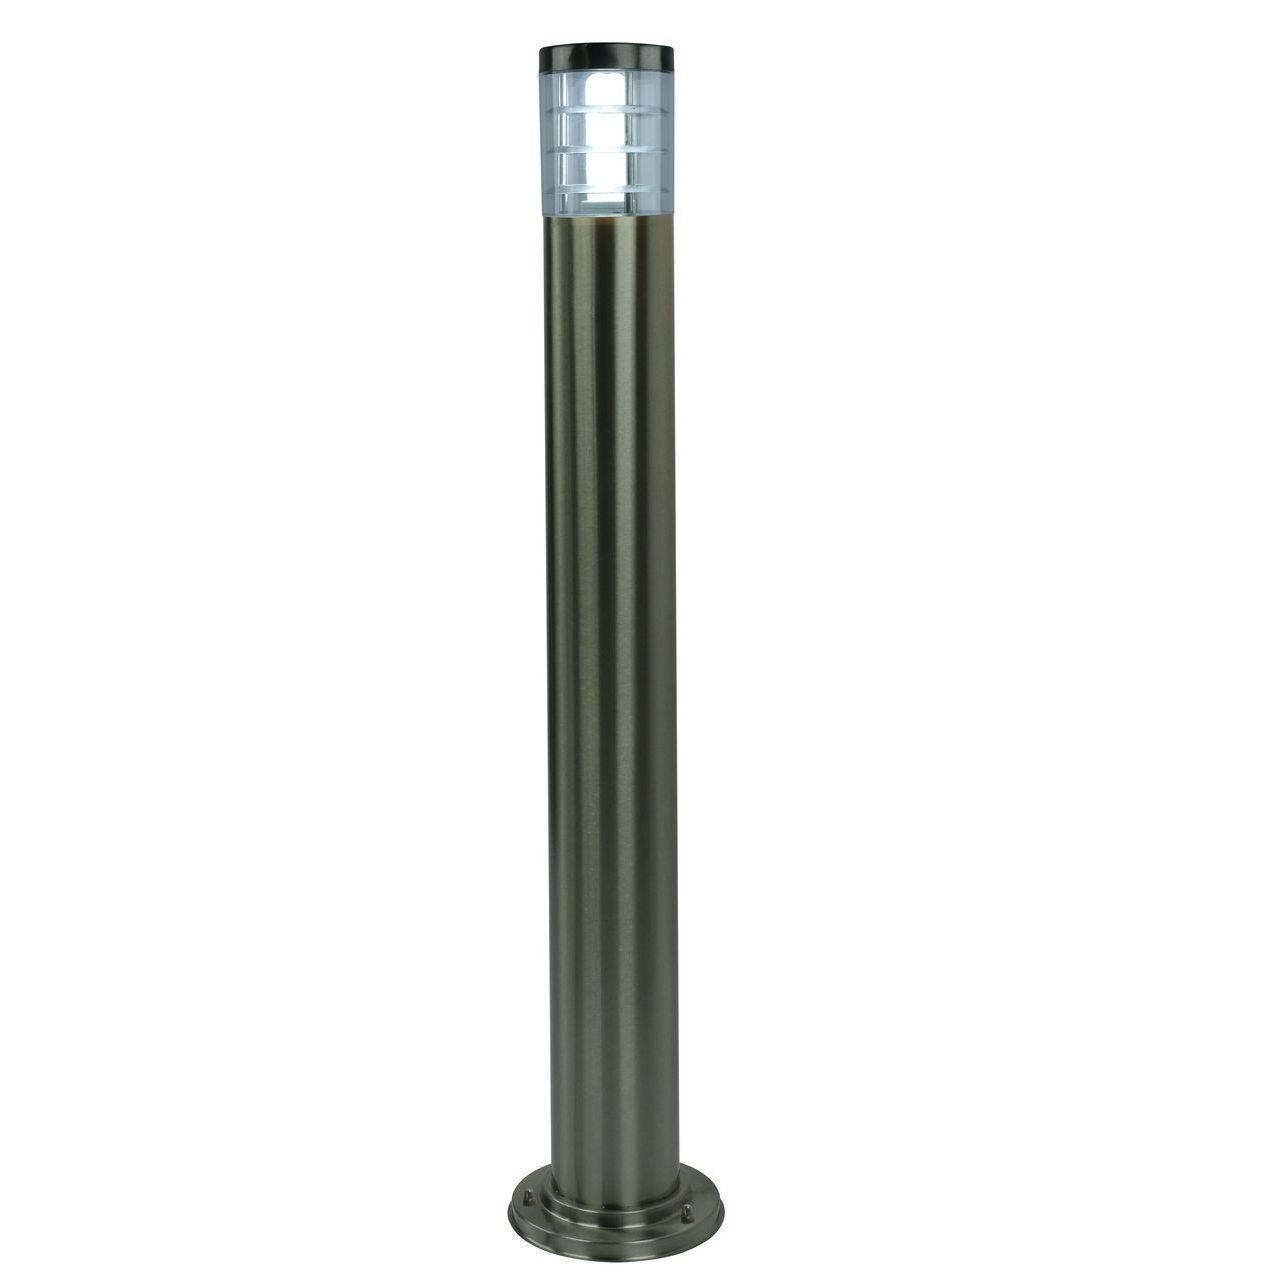 Уличный светильник Arte Lamp Paletto A8363PA-1SS